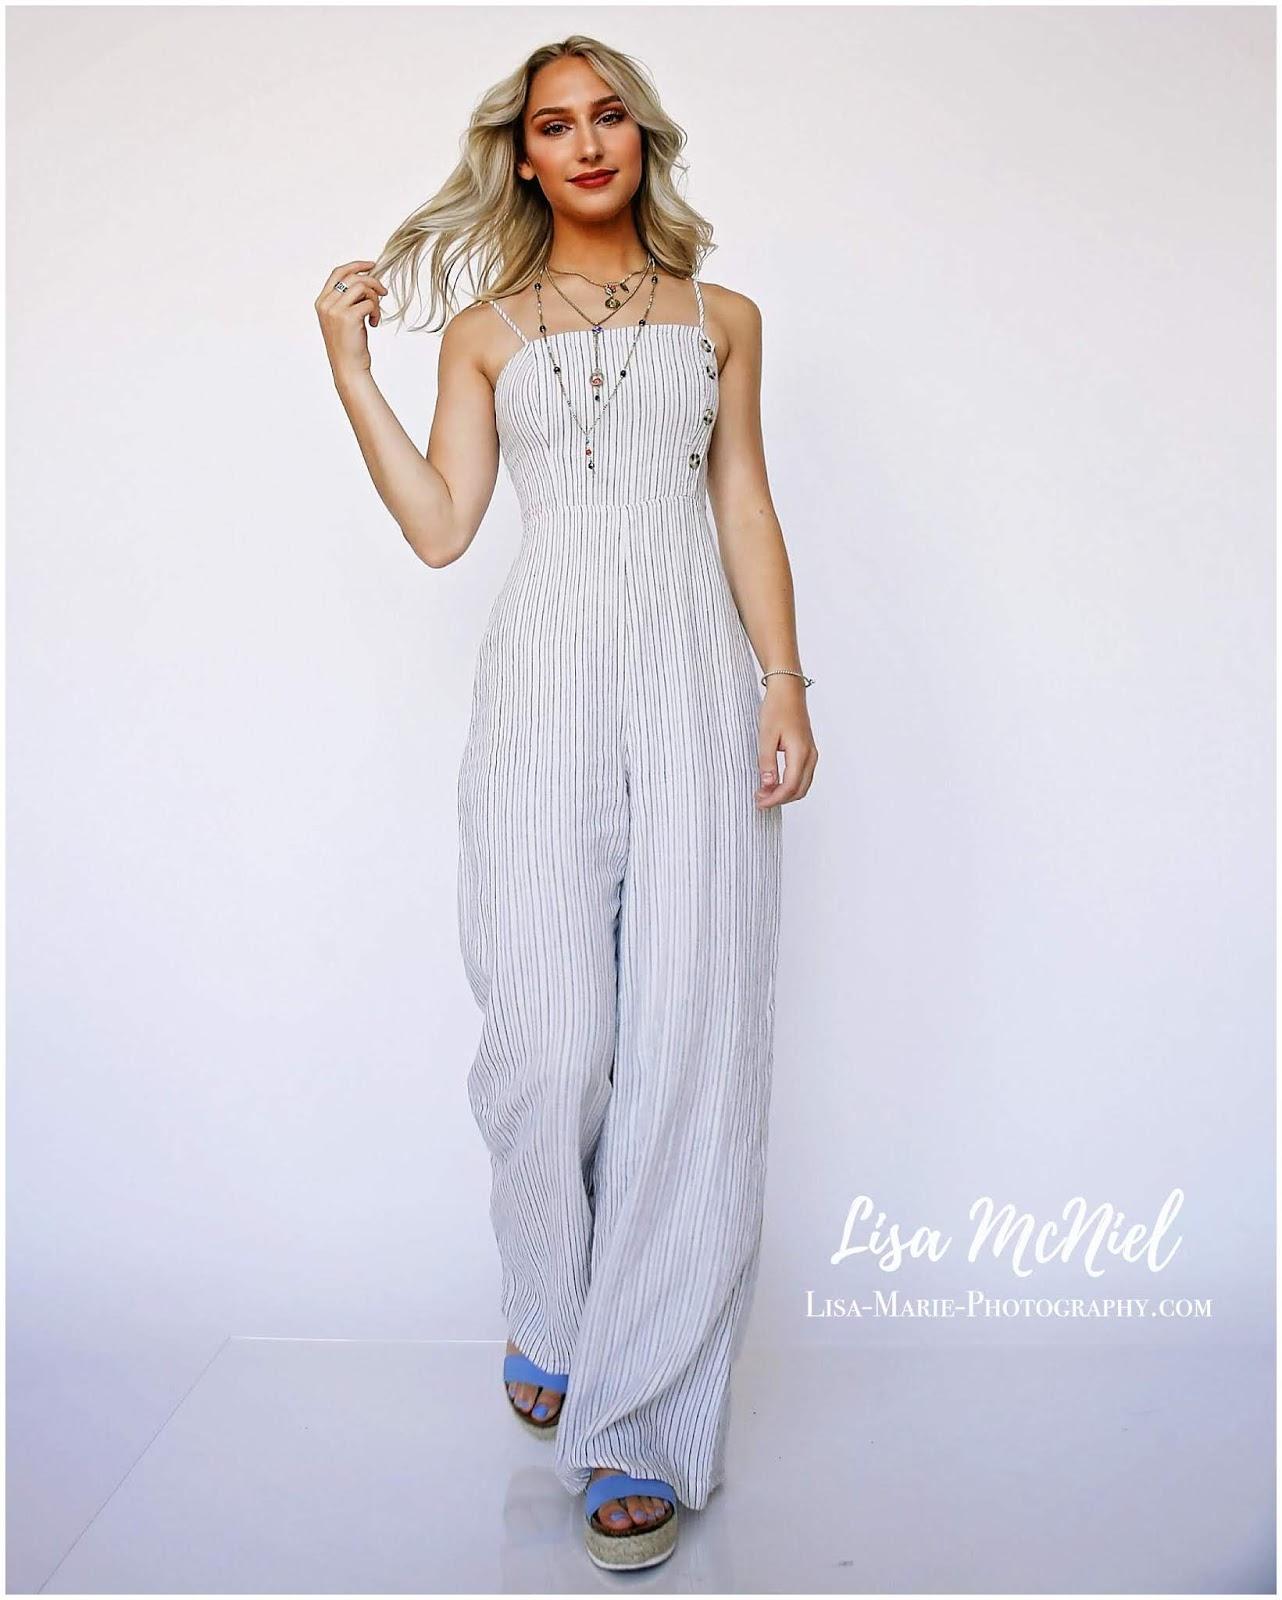 fashion shot of girl on white background